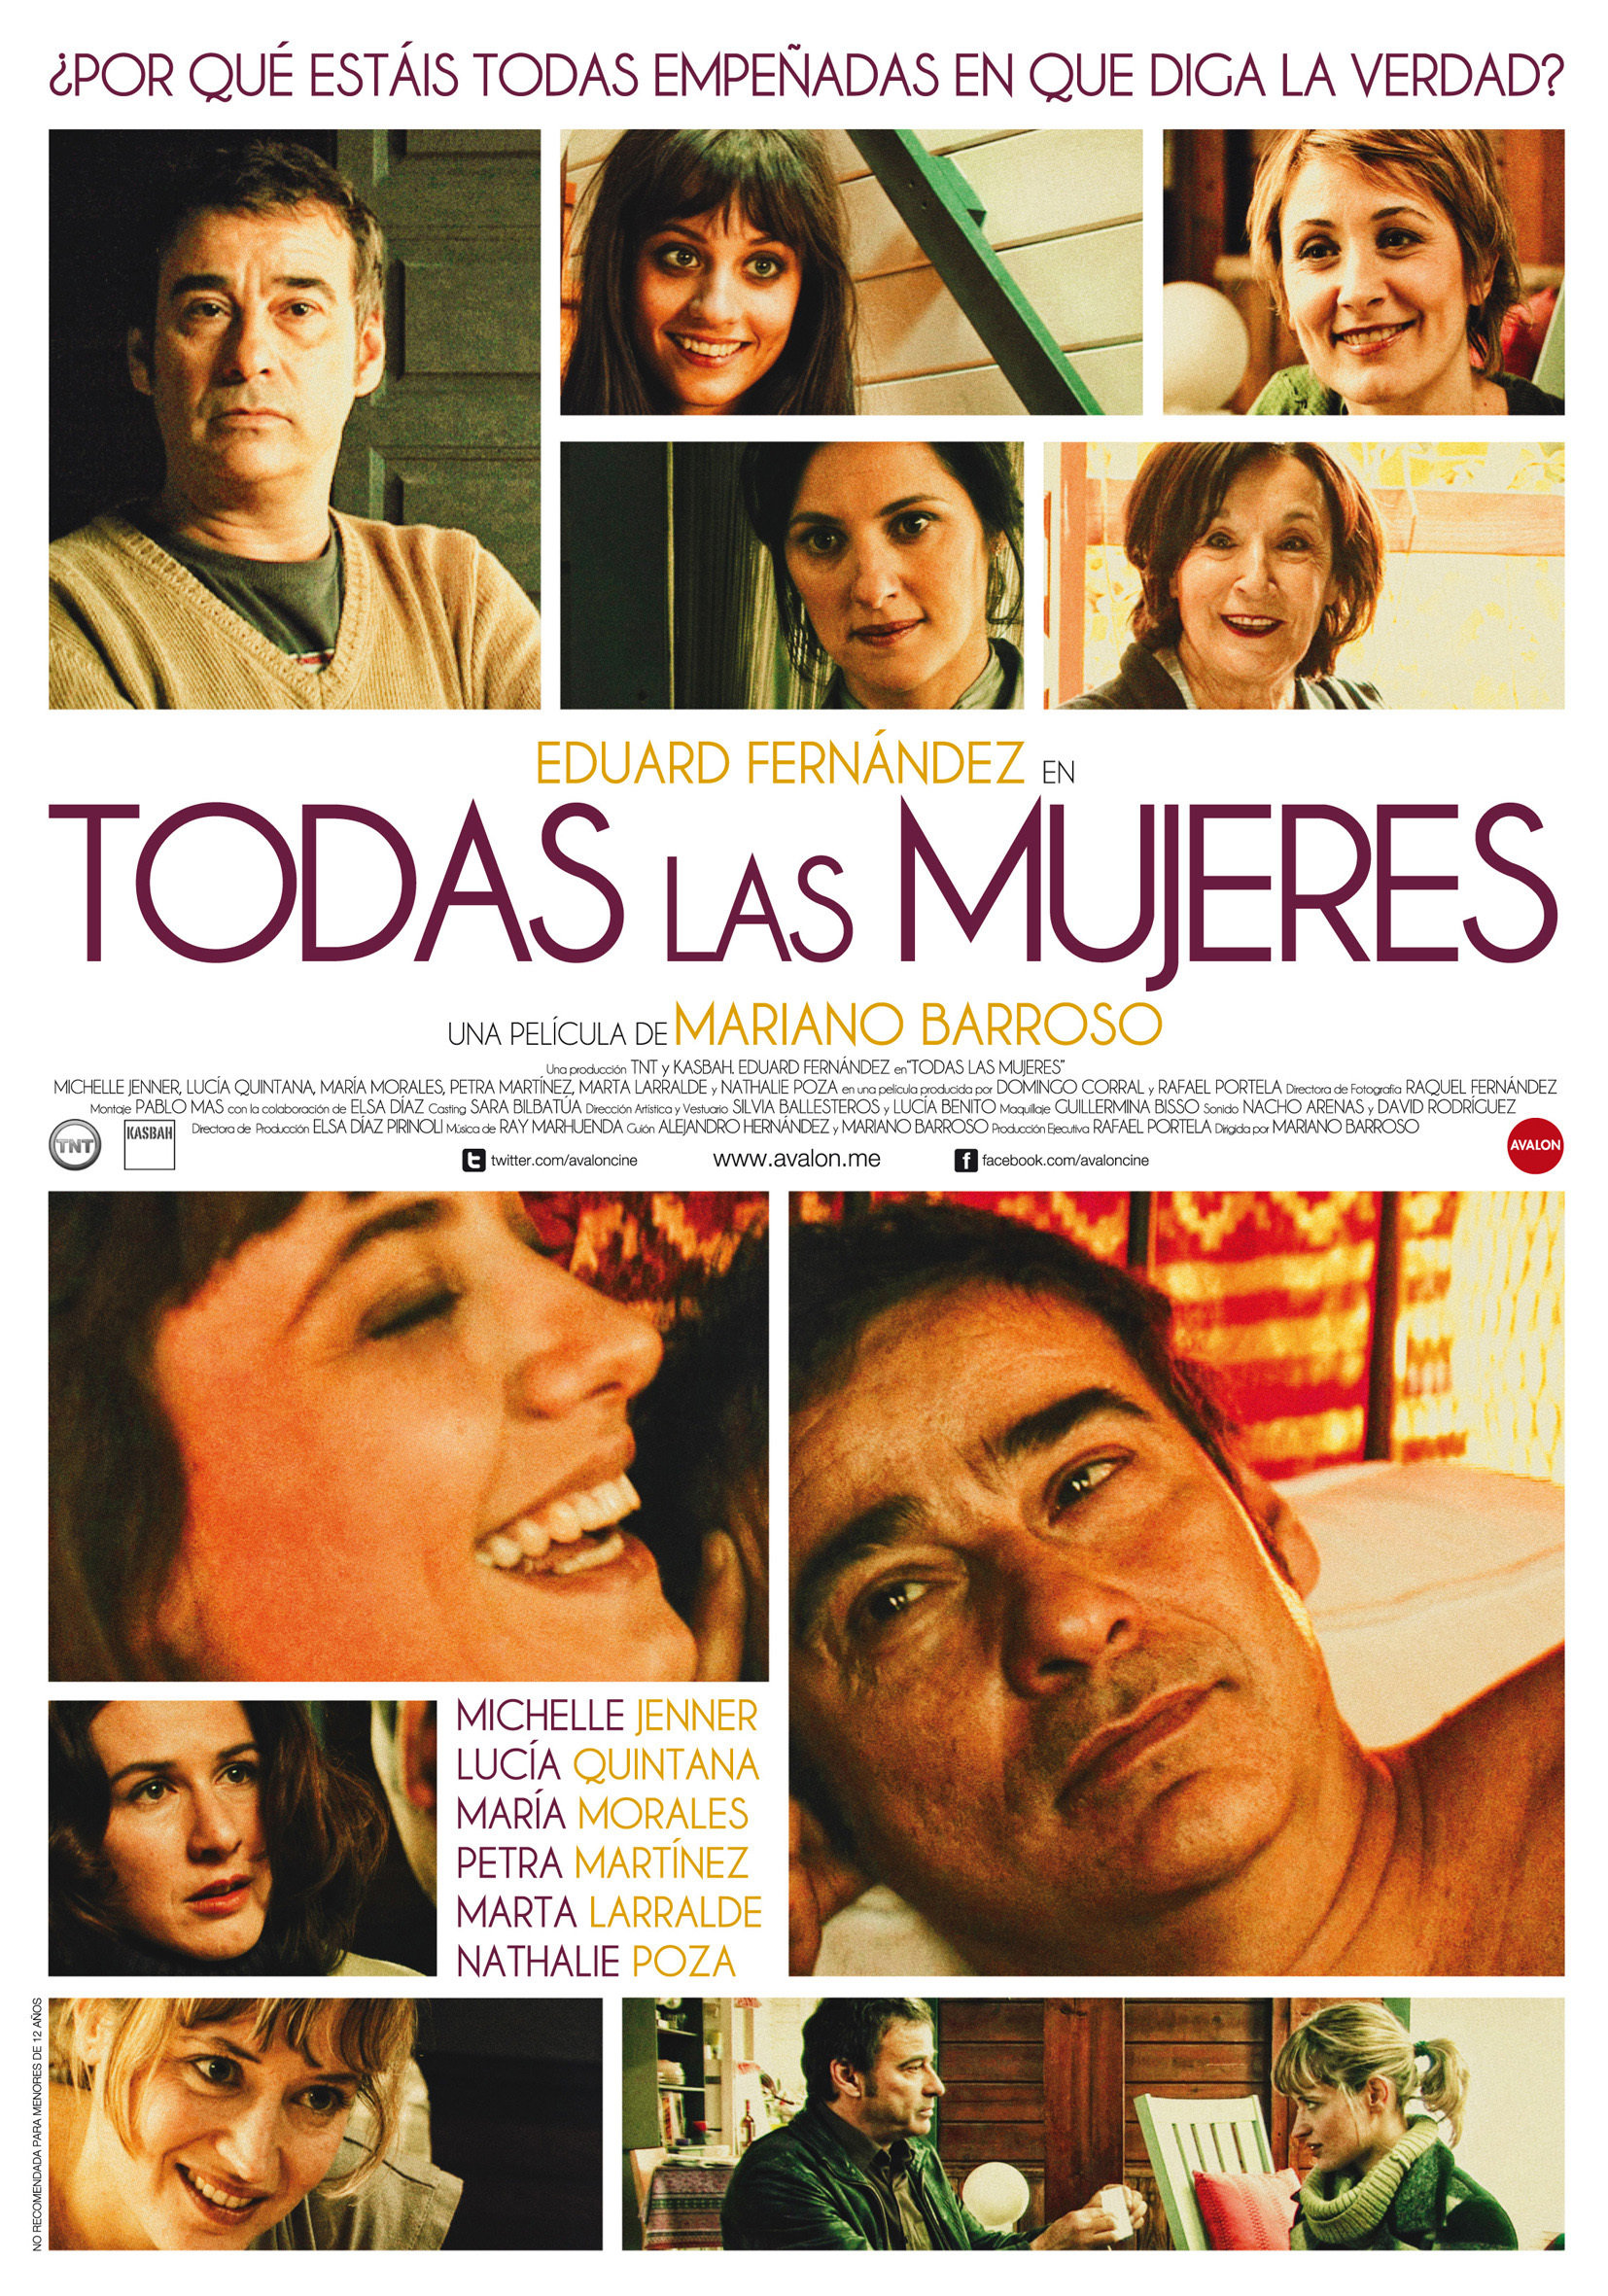 a0219204b63d Todas las mujeres (2013) - IMDb